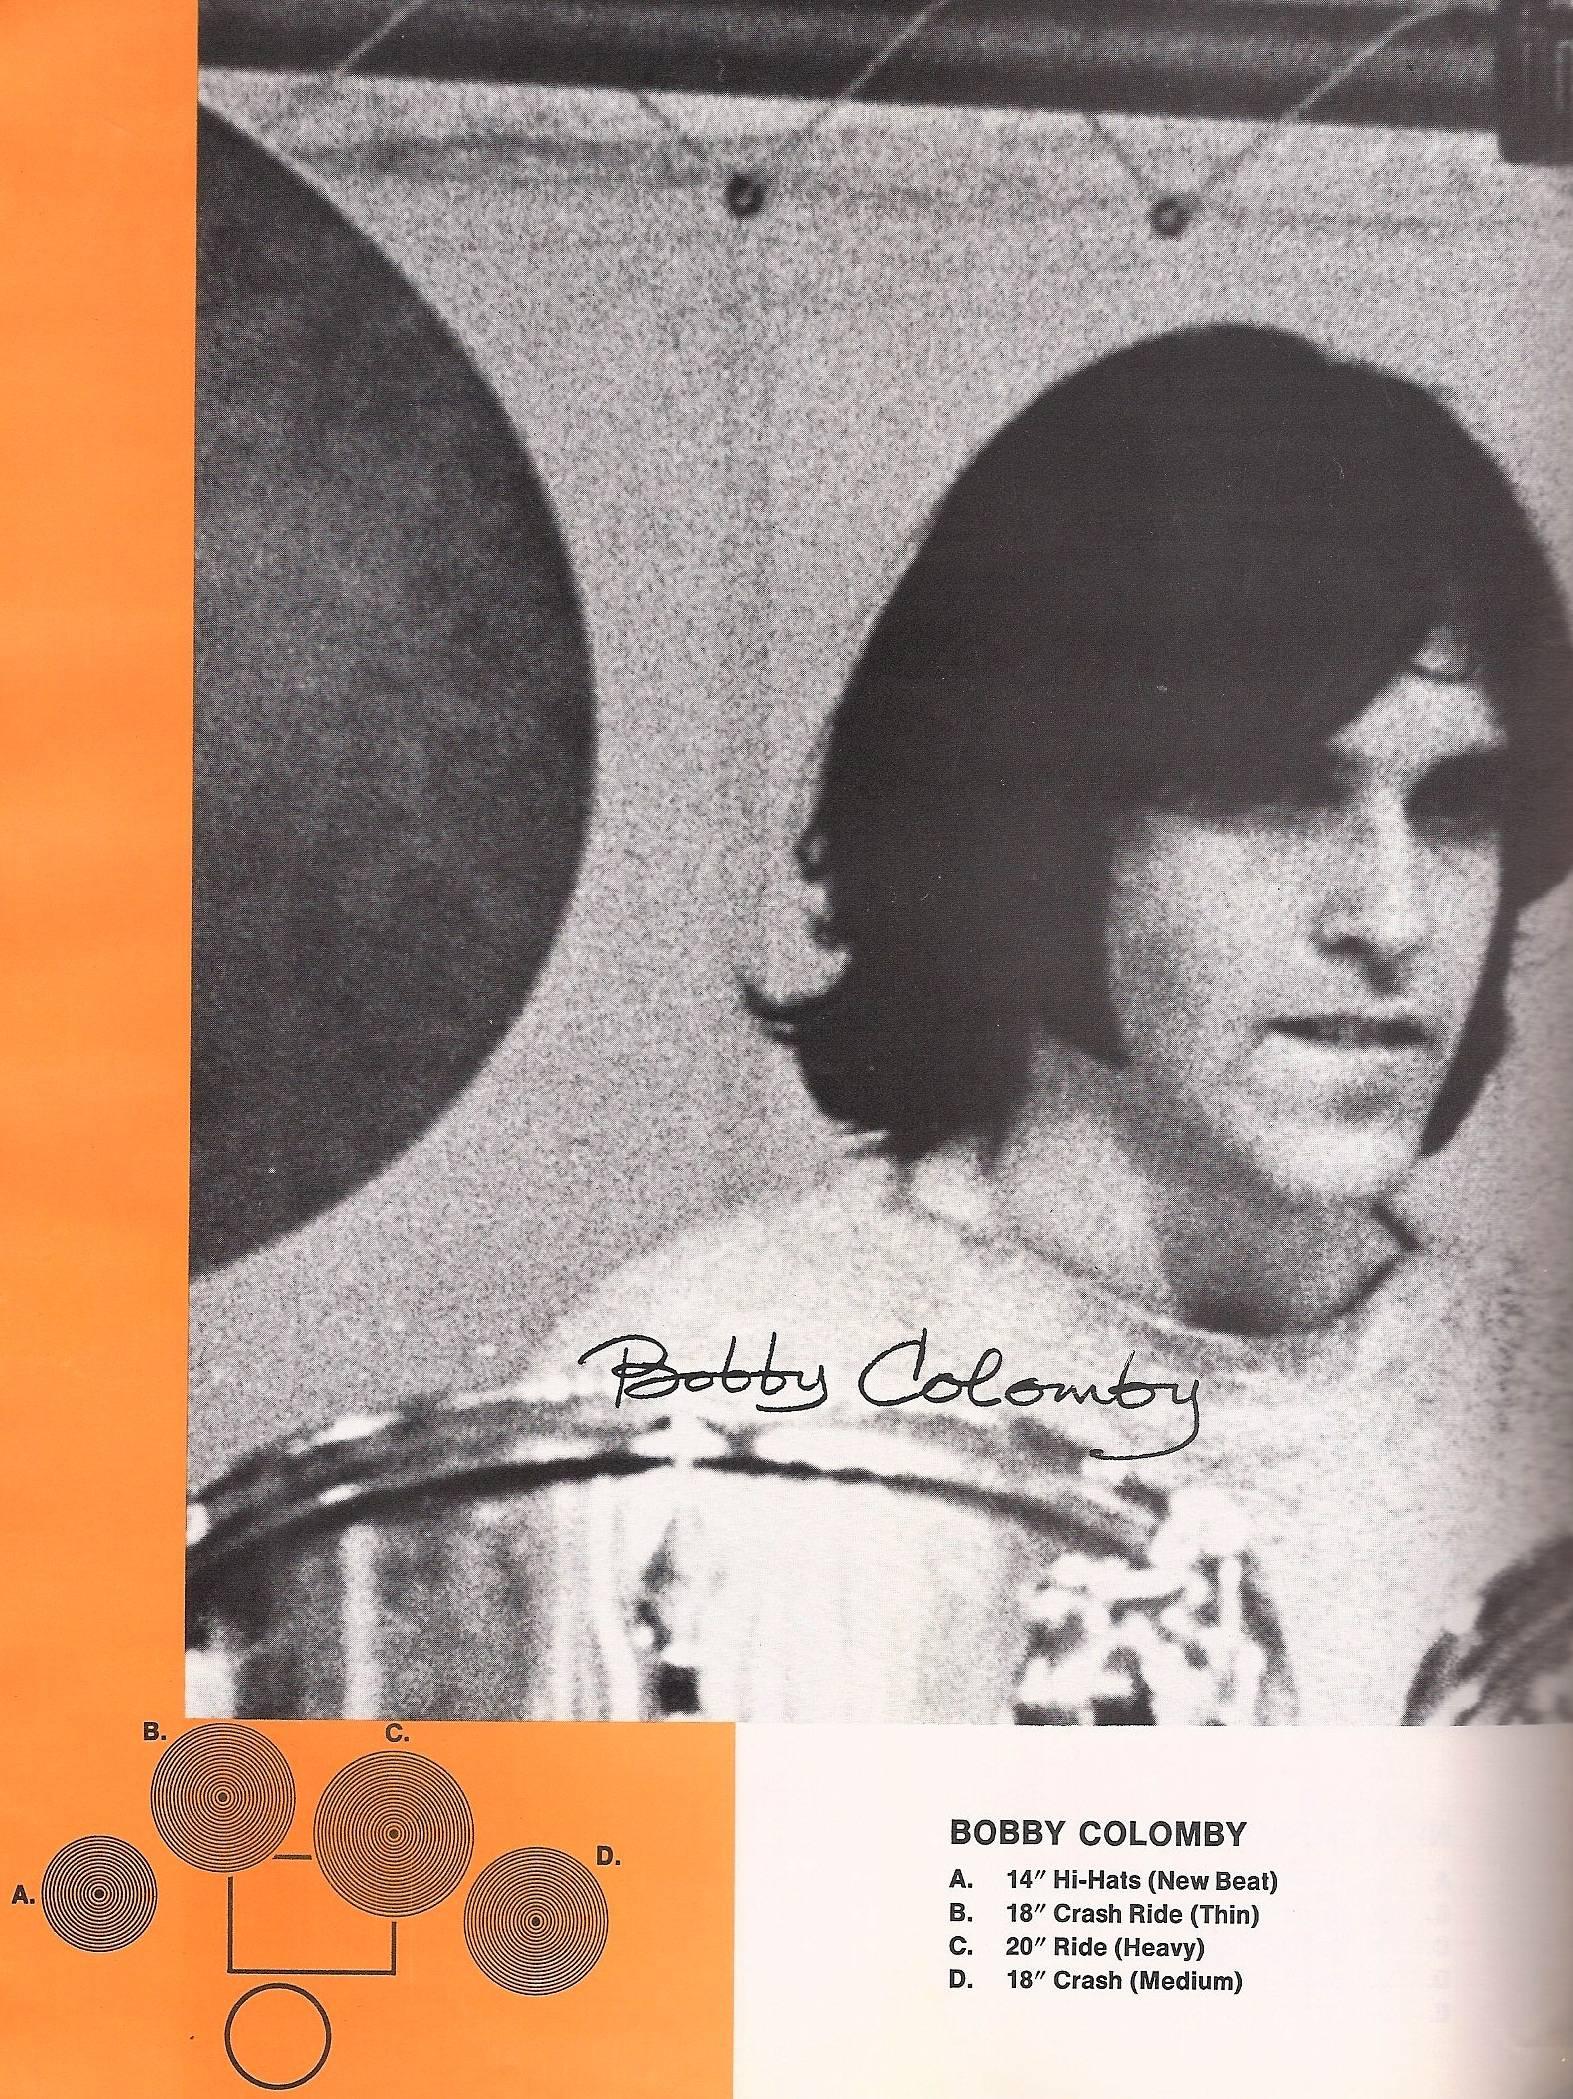 Bobby Colomby on the Zildjian catalog 1969